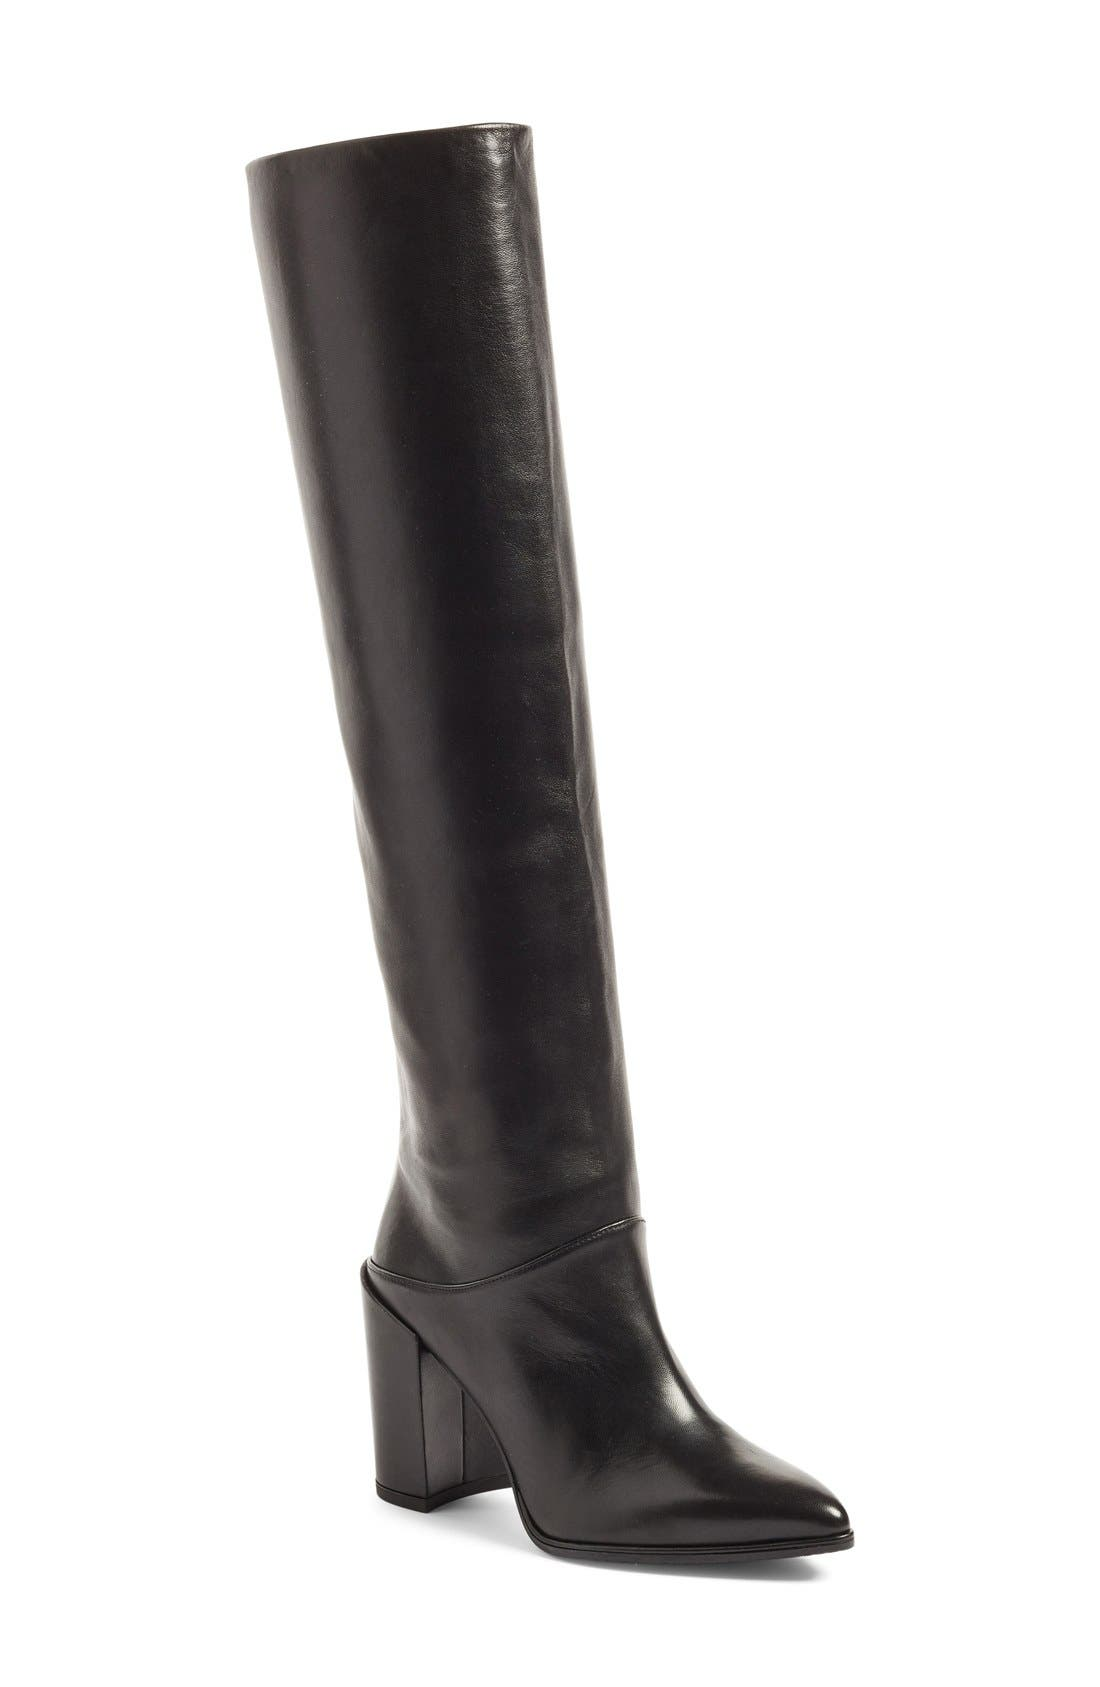 Main Image - Stuart Weitzman Scrunchy Leather Knee High Boot (Women)